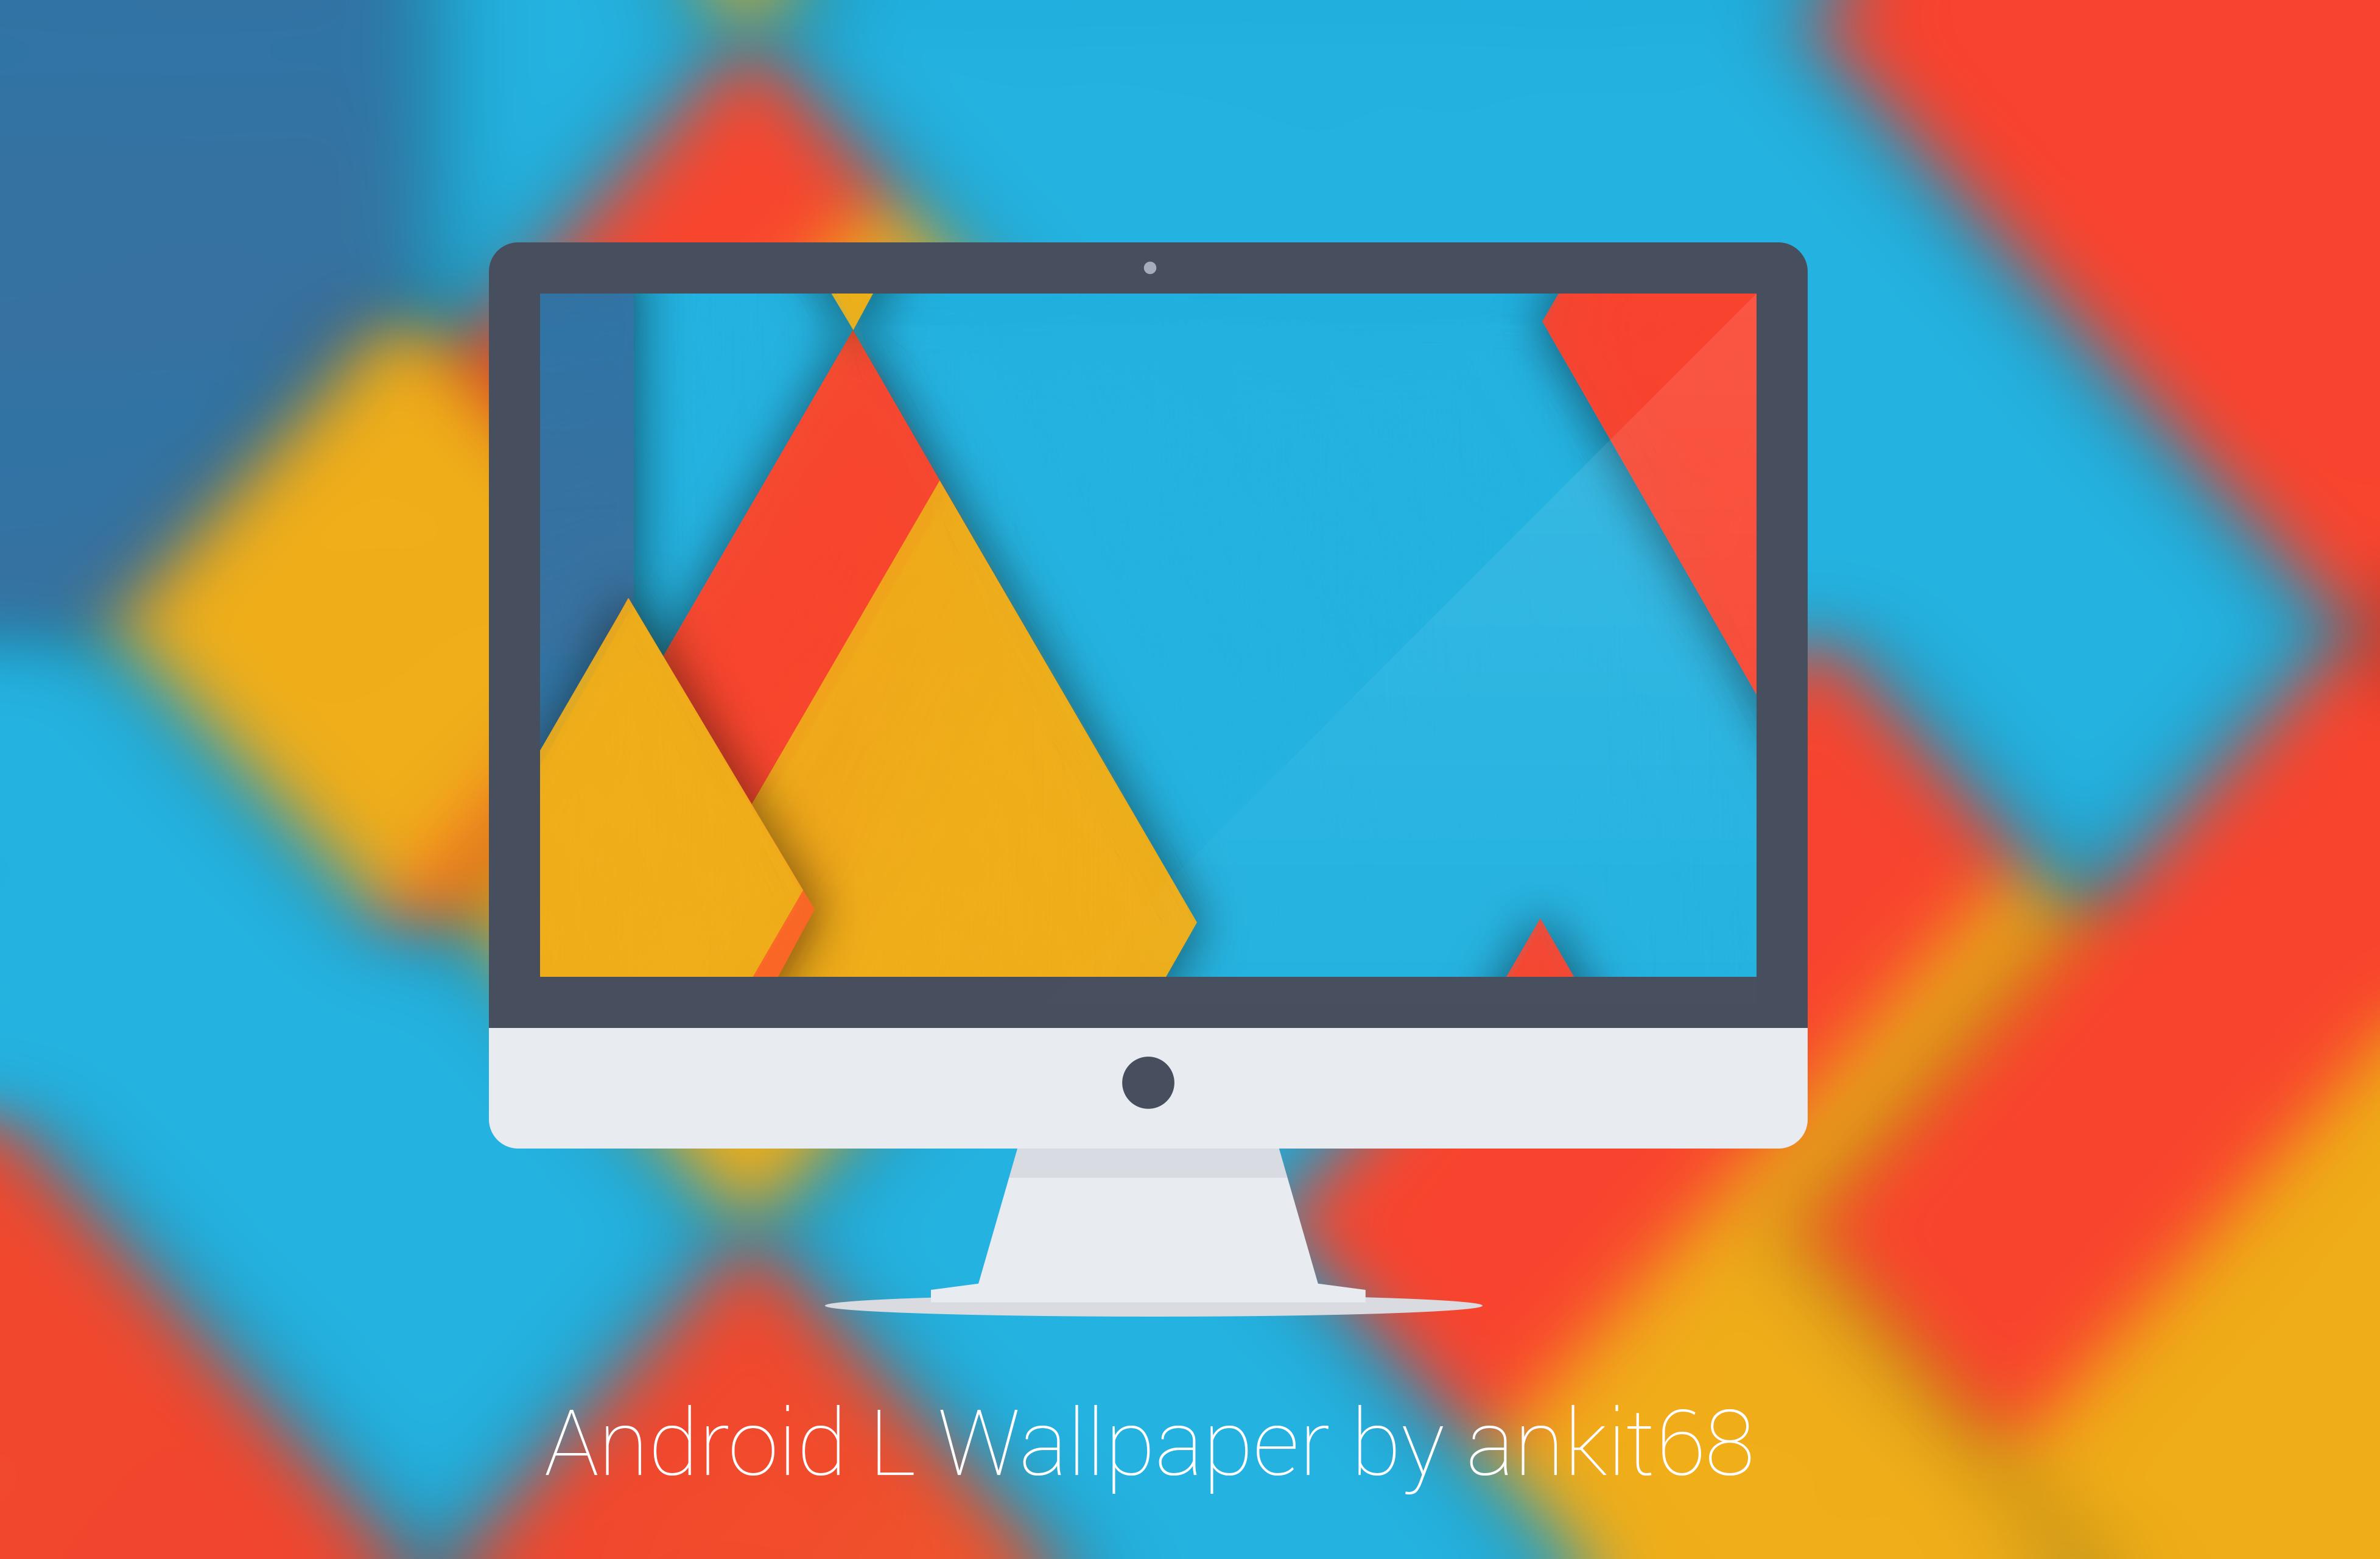 android l wallpaper by ankit68 d8ckq5d